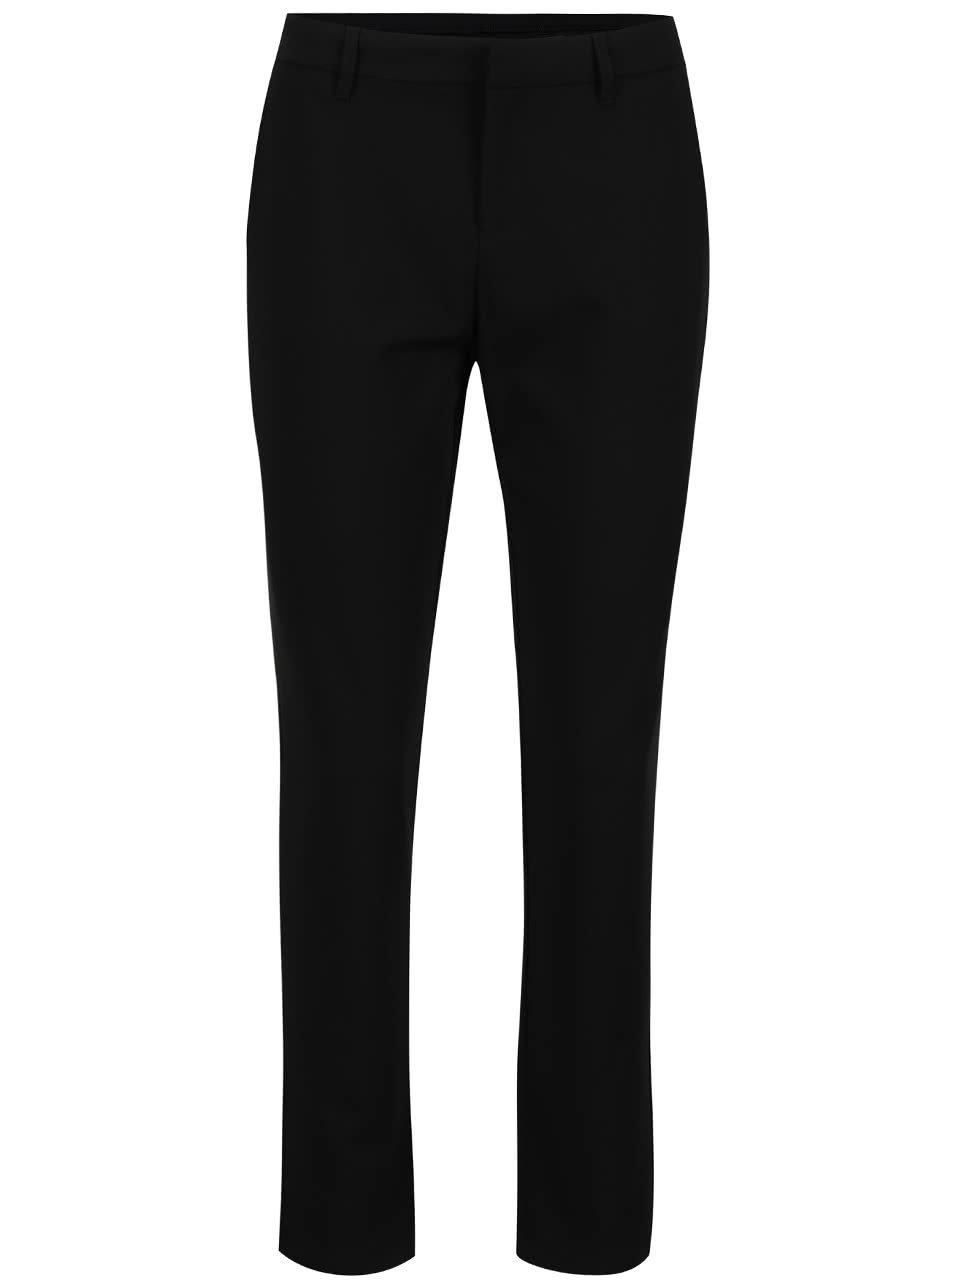 462366cd7 Čierne dámske nohavice QS by s.Oliver | ZOOT.sk